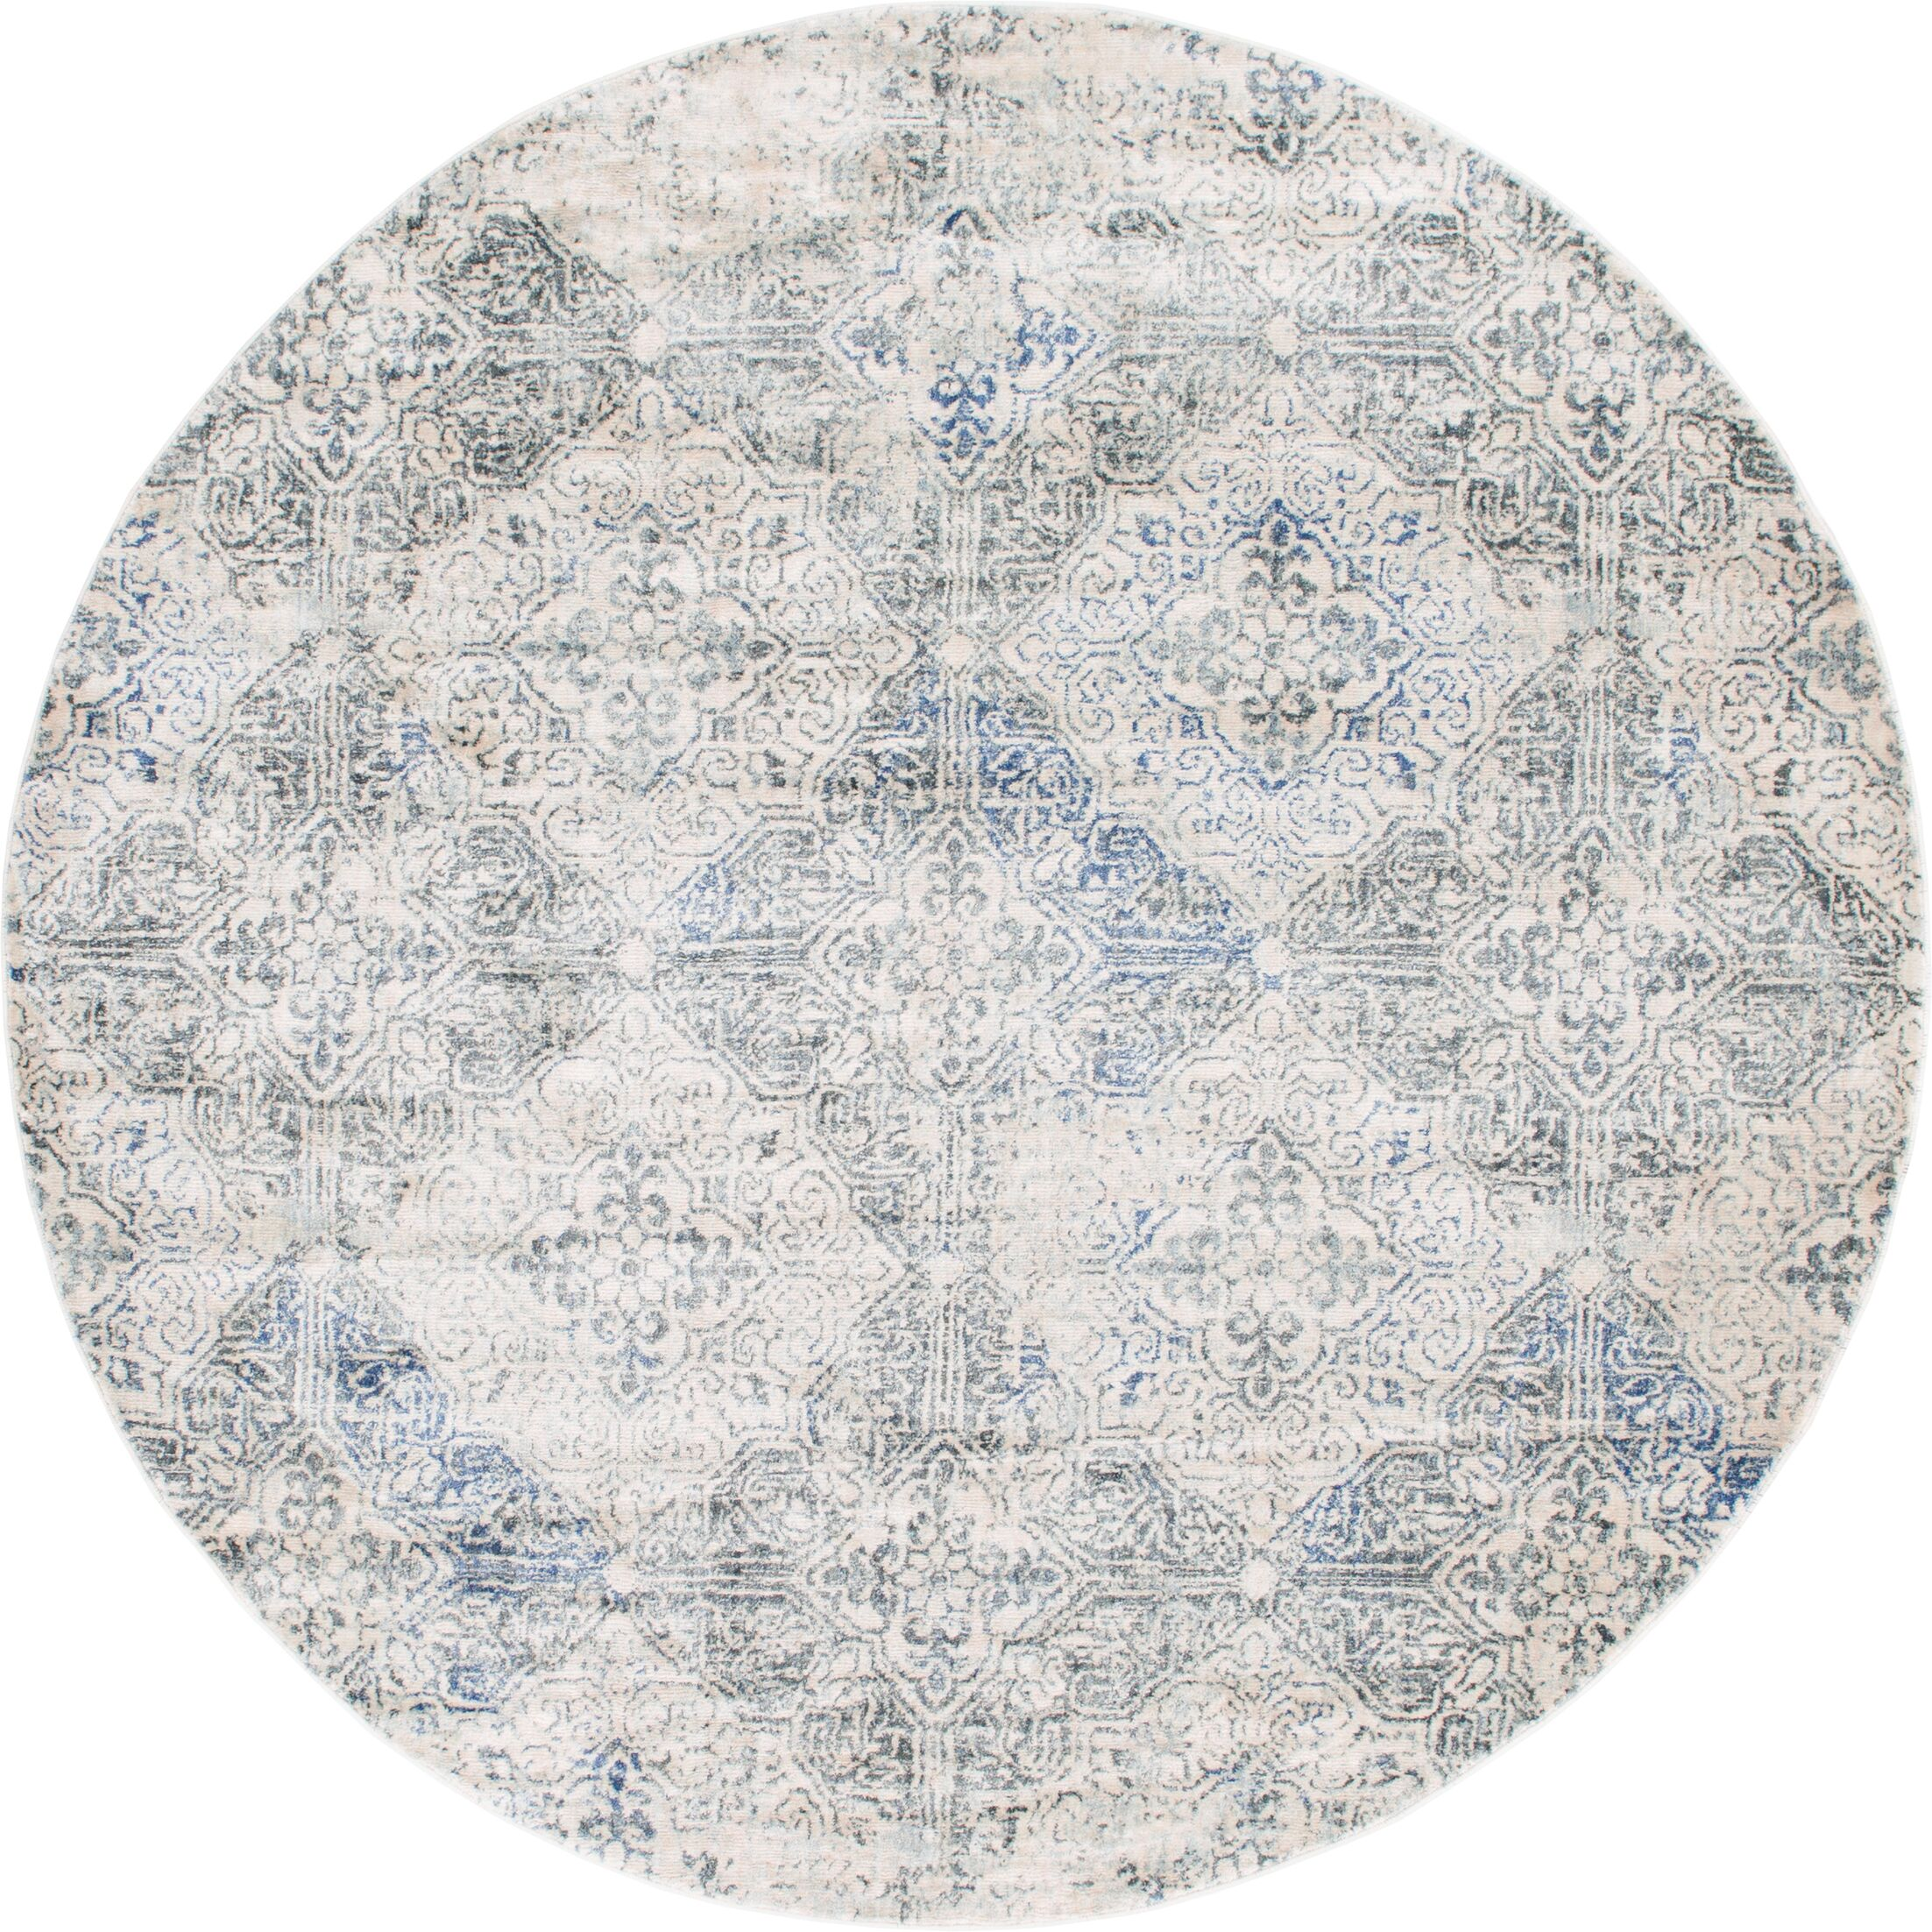 Parodi Gray Area Rug Rug Size: Round 8'